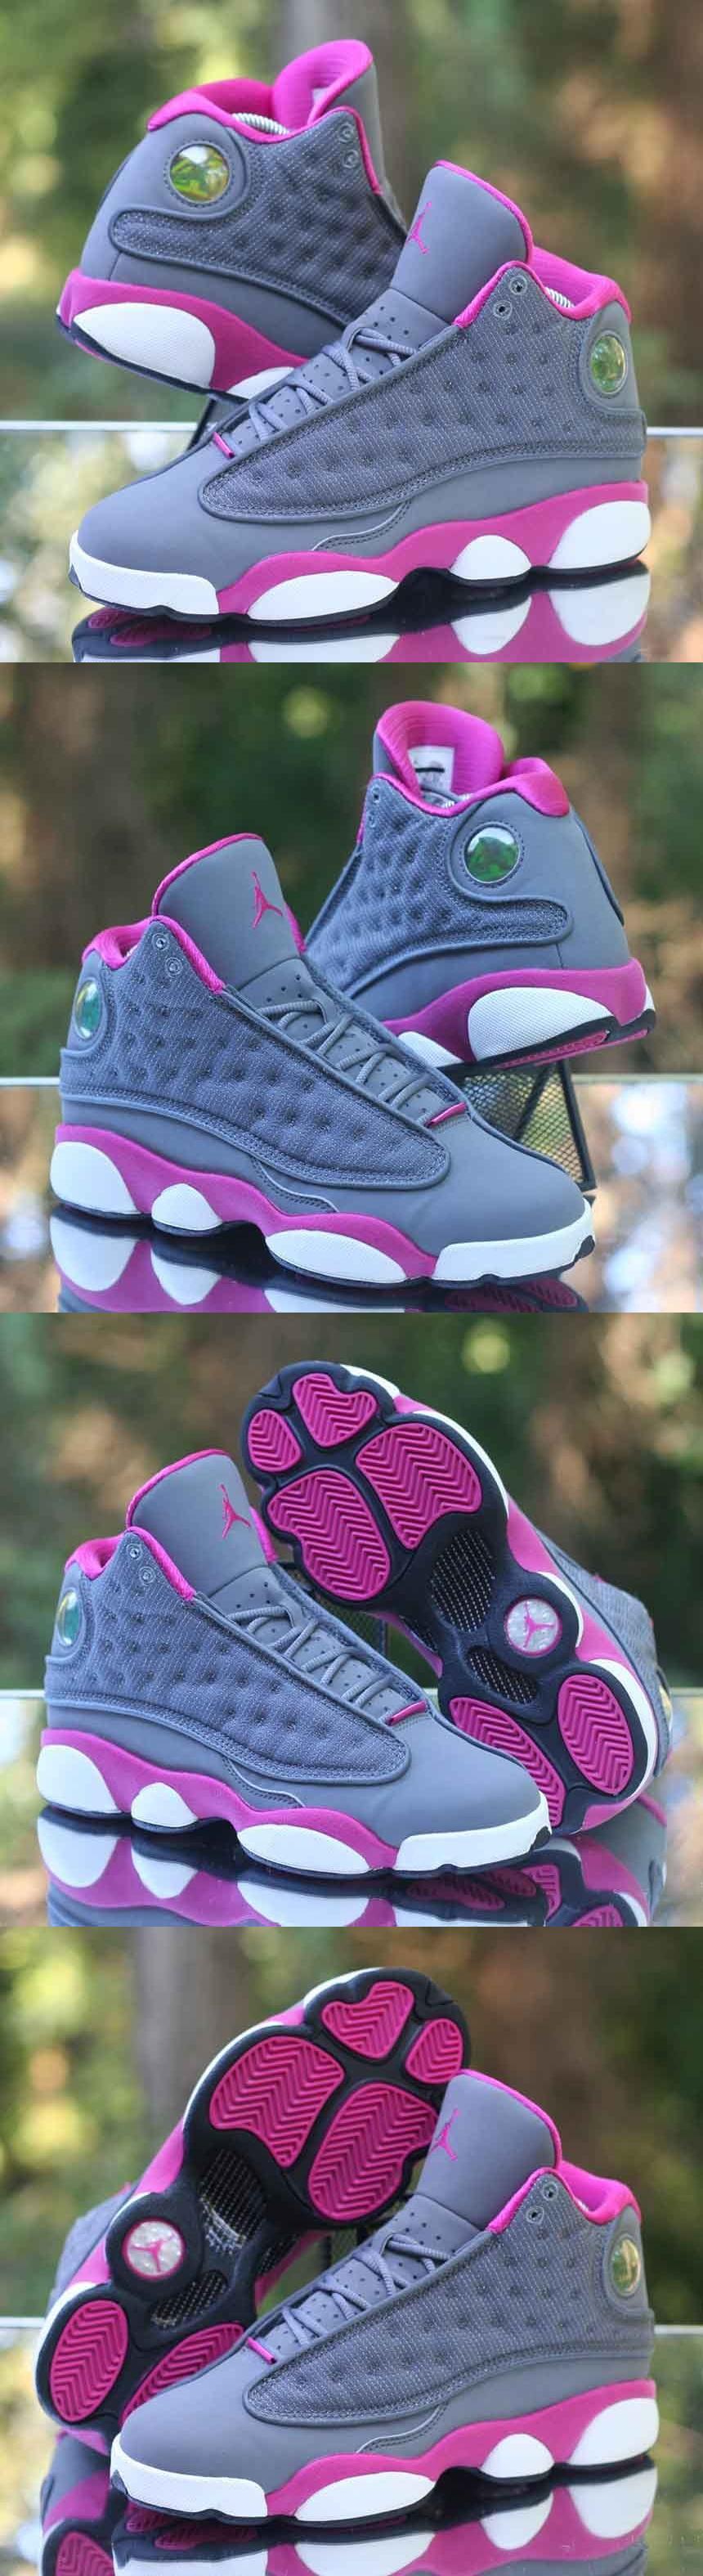 girls shoes 57974 nike girls air jordan 13 retro gs cool grey fusion pink 439358